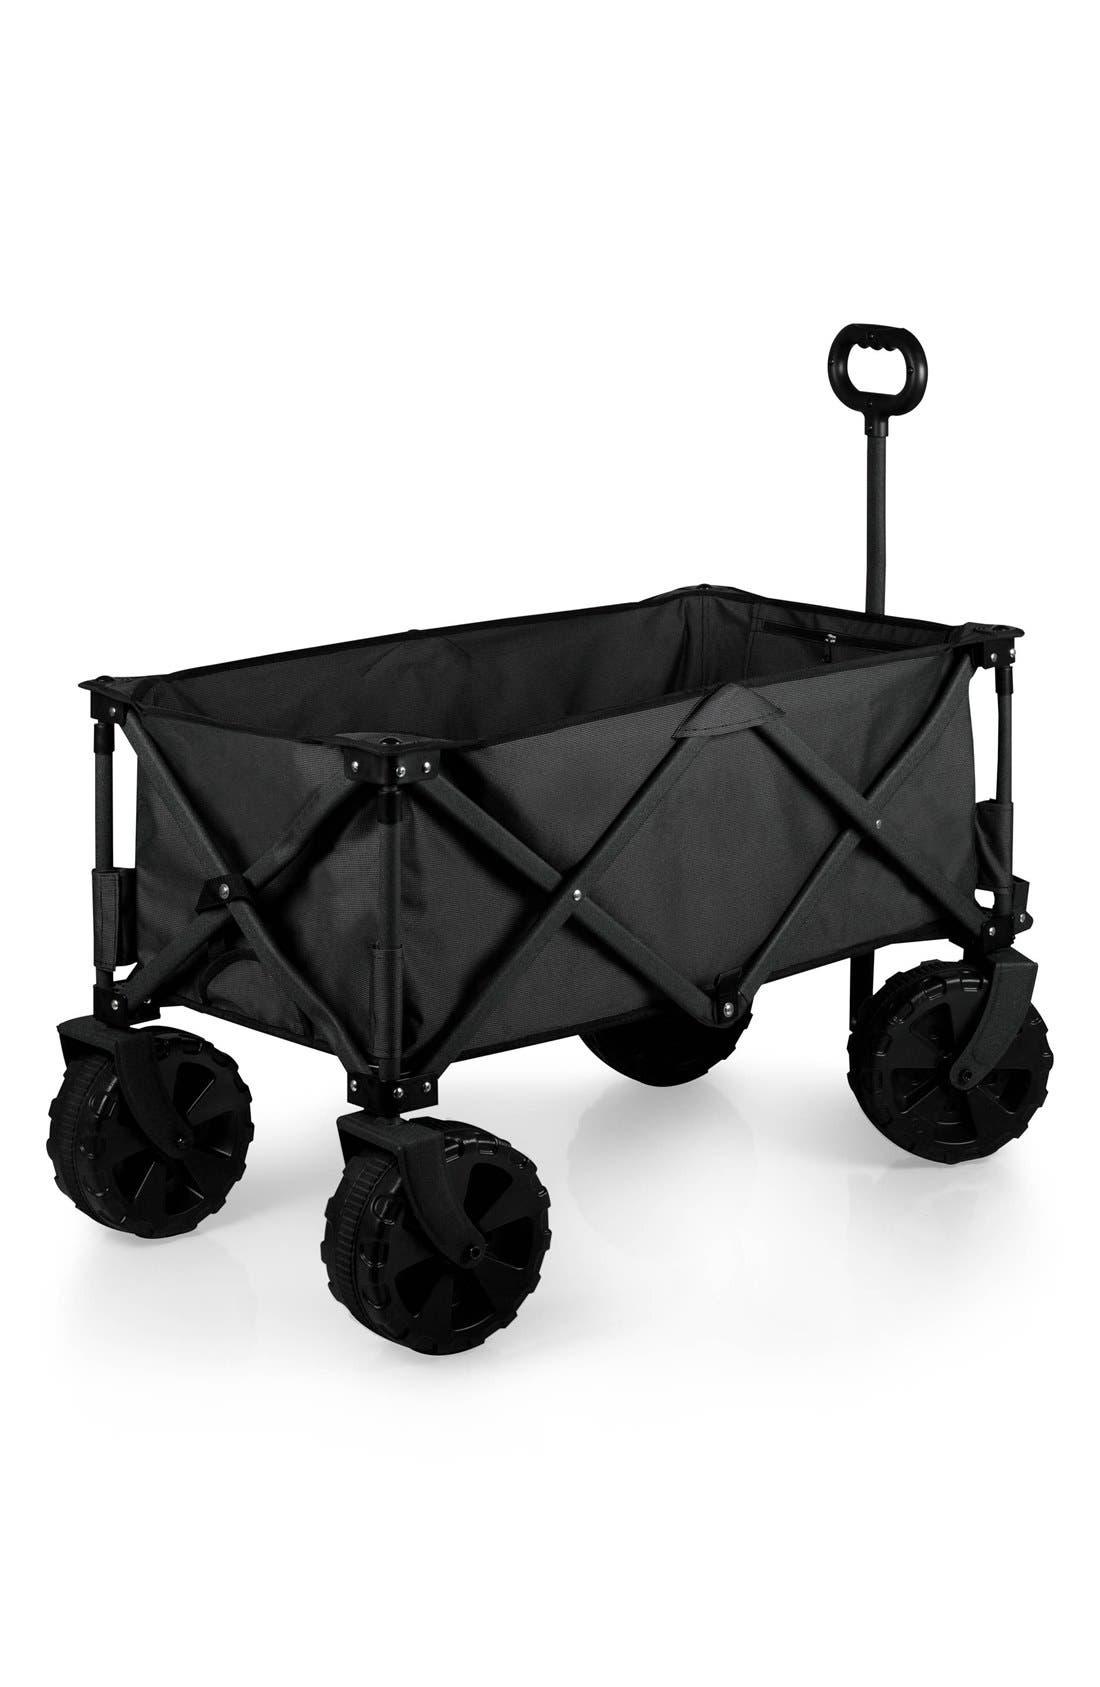 Alternate Image 1 Selected - Picnic Time All Terrain Adventure Wagon